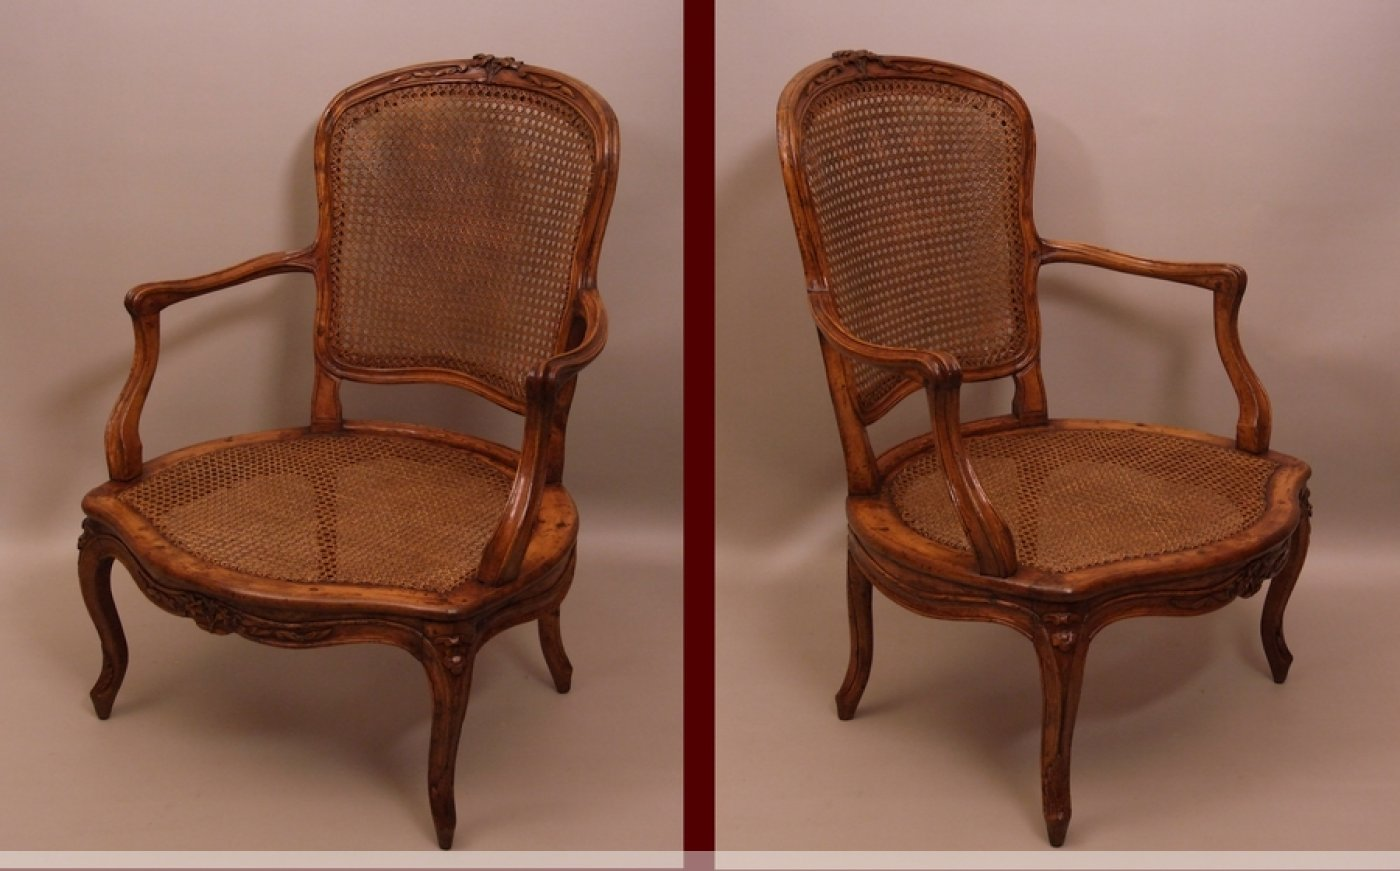 tr s large fauteuil cabriolet d 39 poque louis xv xviiie. Black Bedroom Furniture Sets. Home Design Ideas